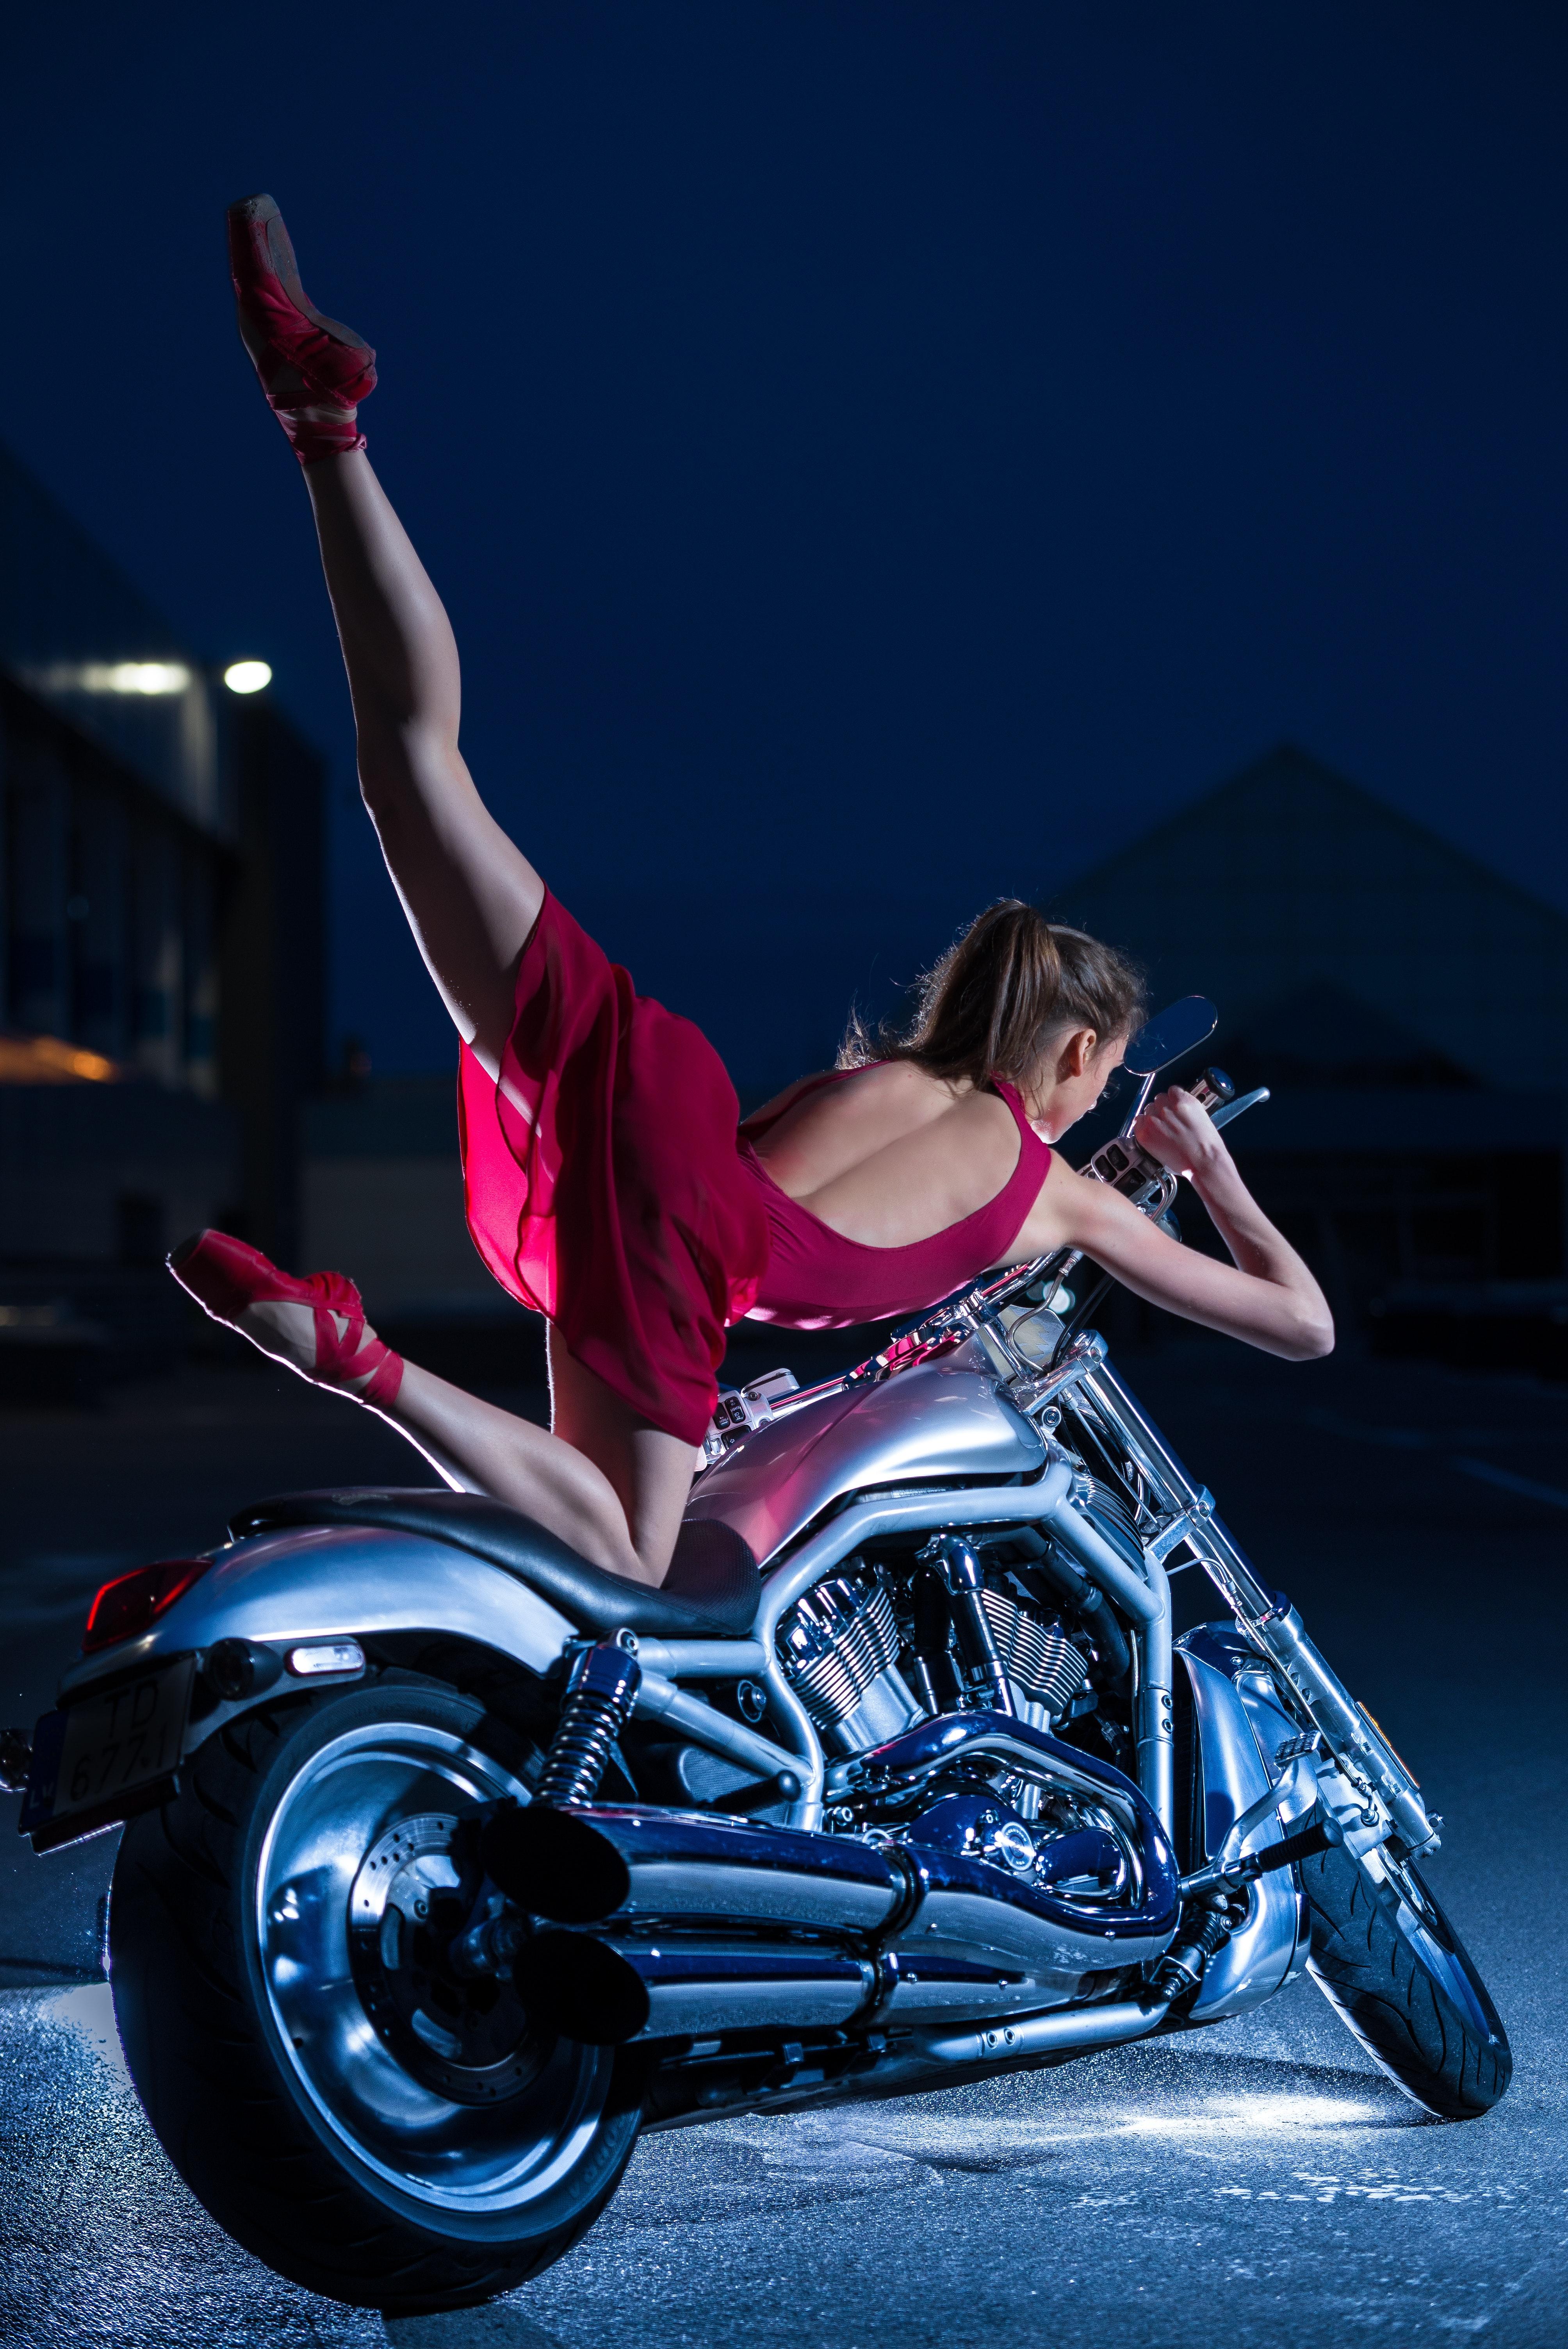 Woman Wearing Purple Dress Ride on Motorcycle during